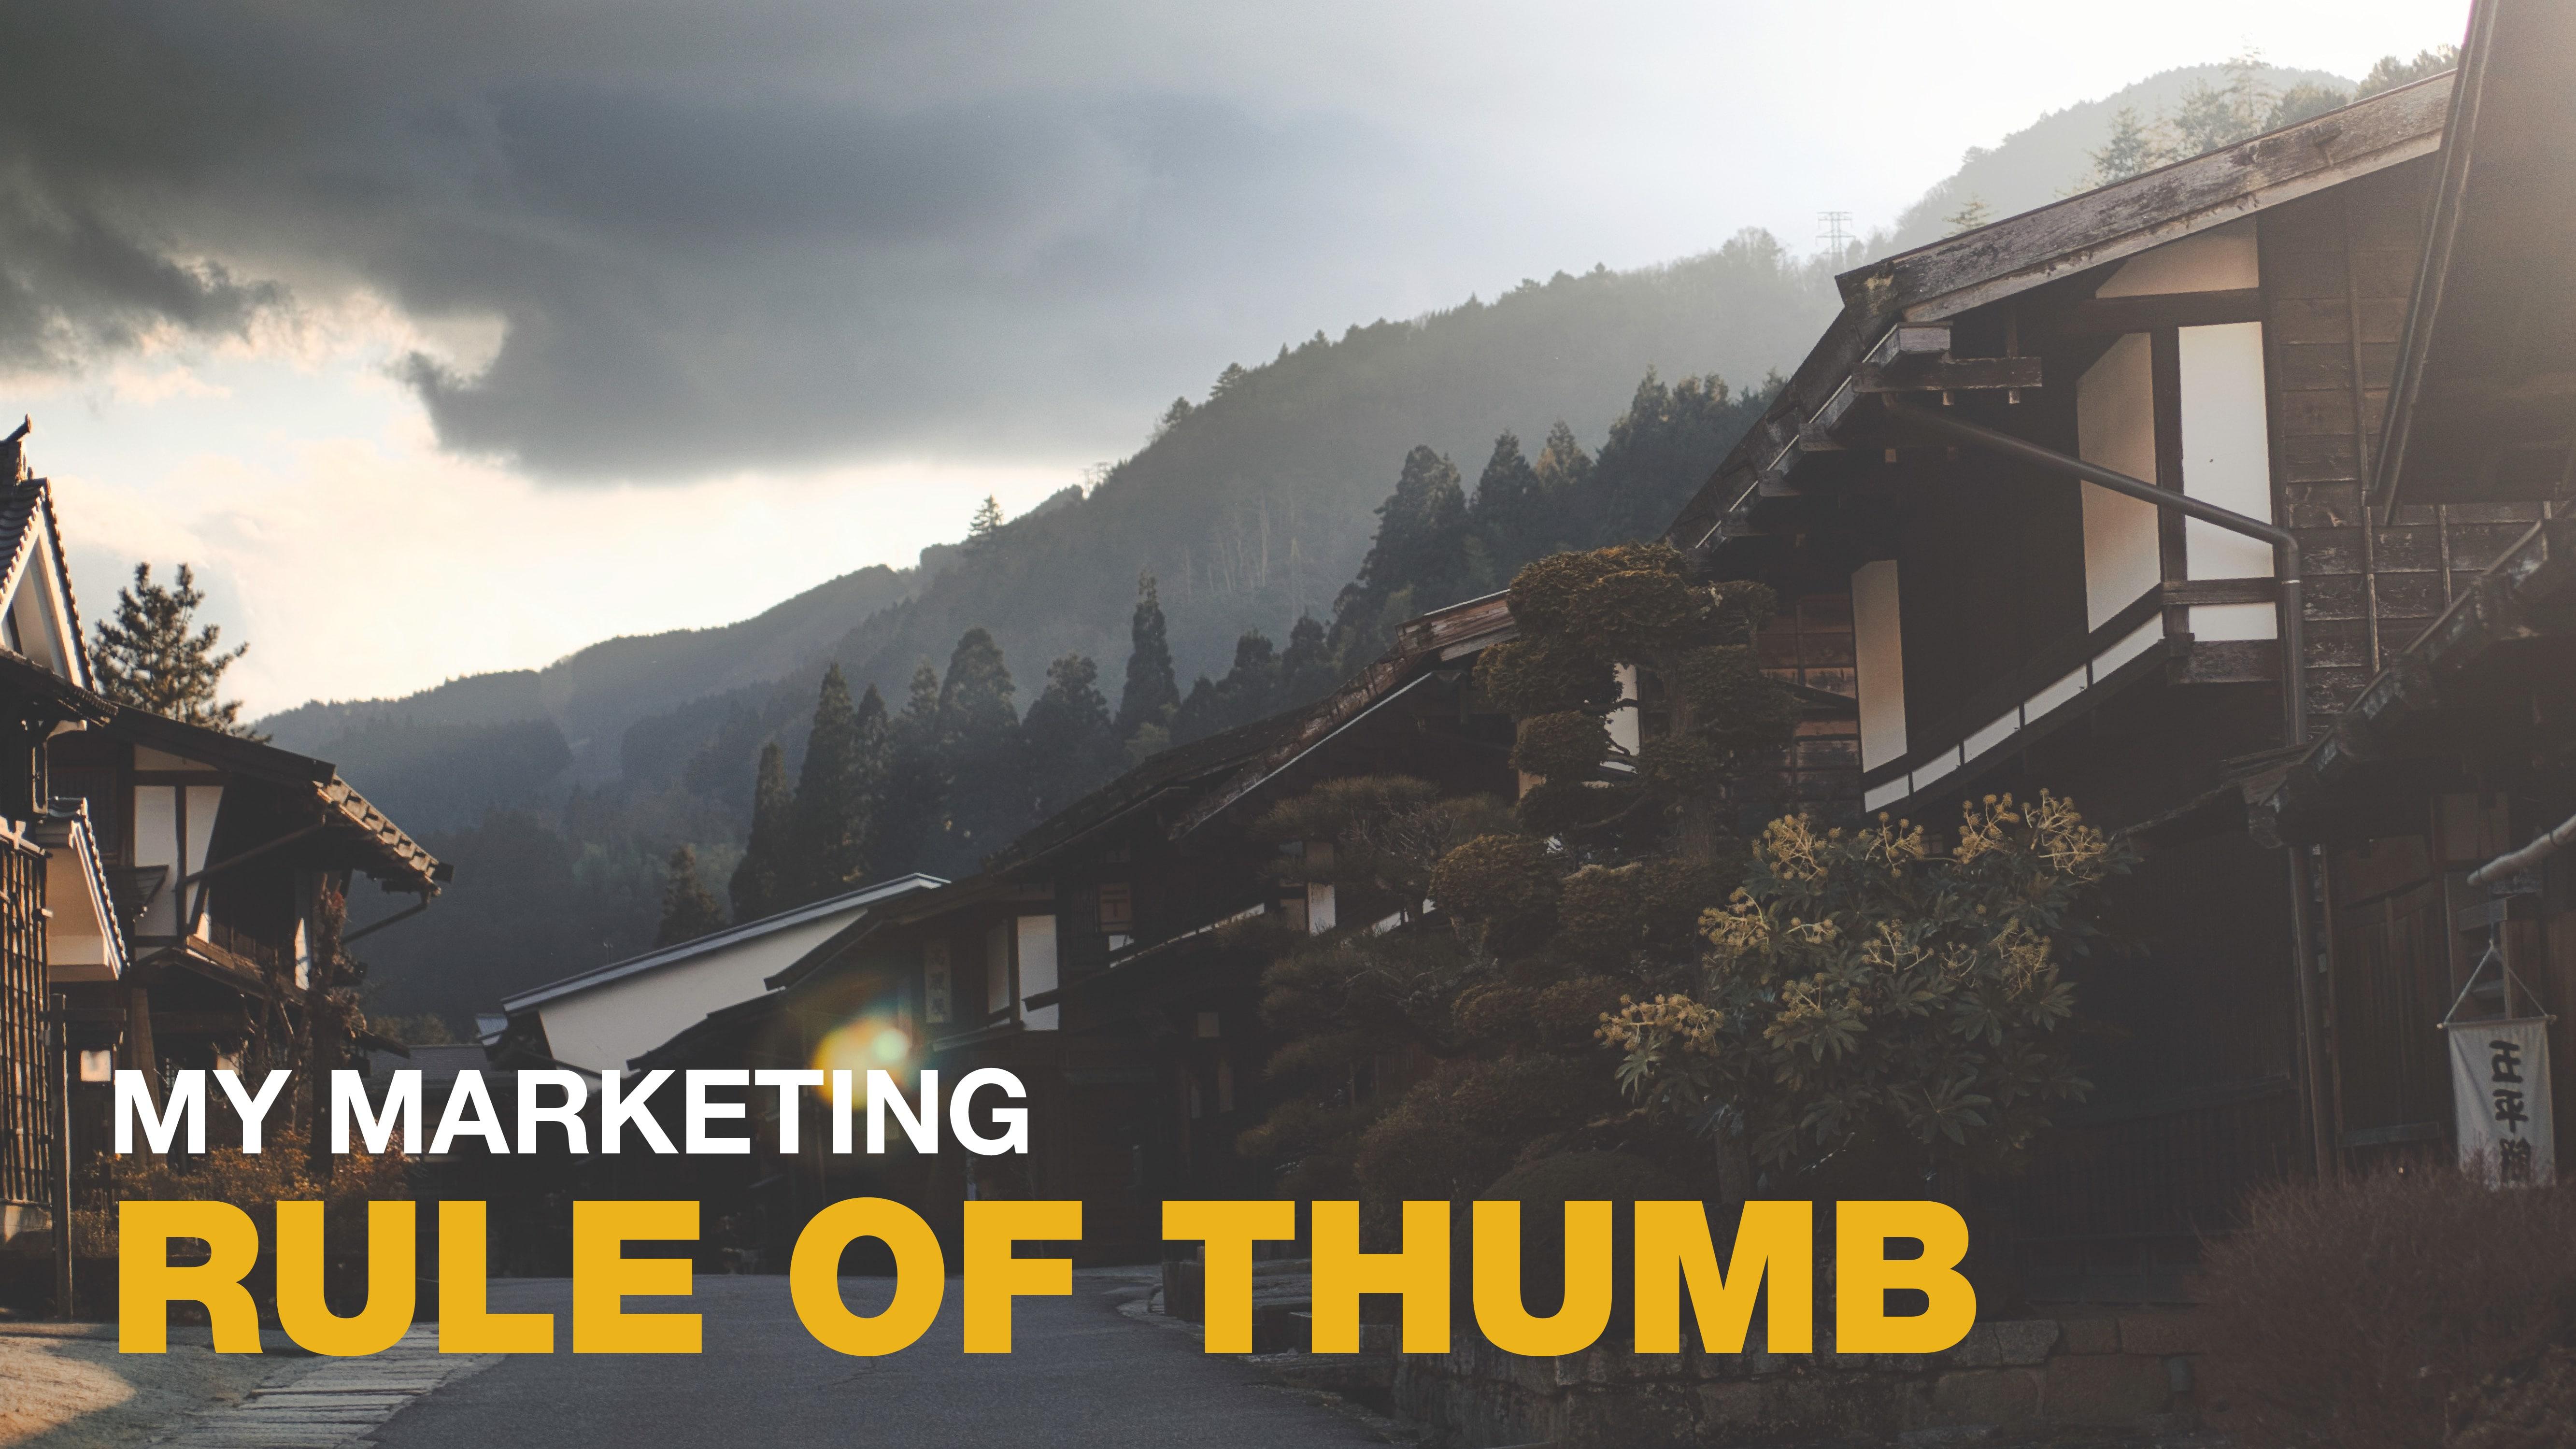 My marketing rule of thumb